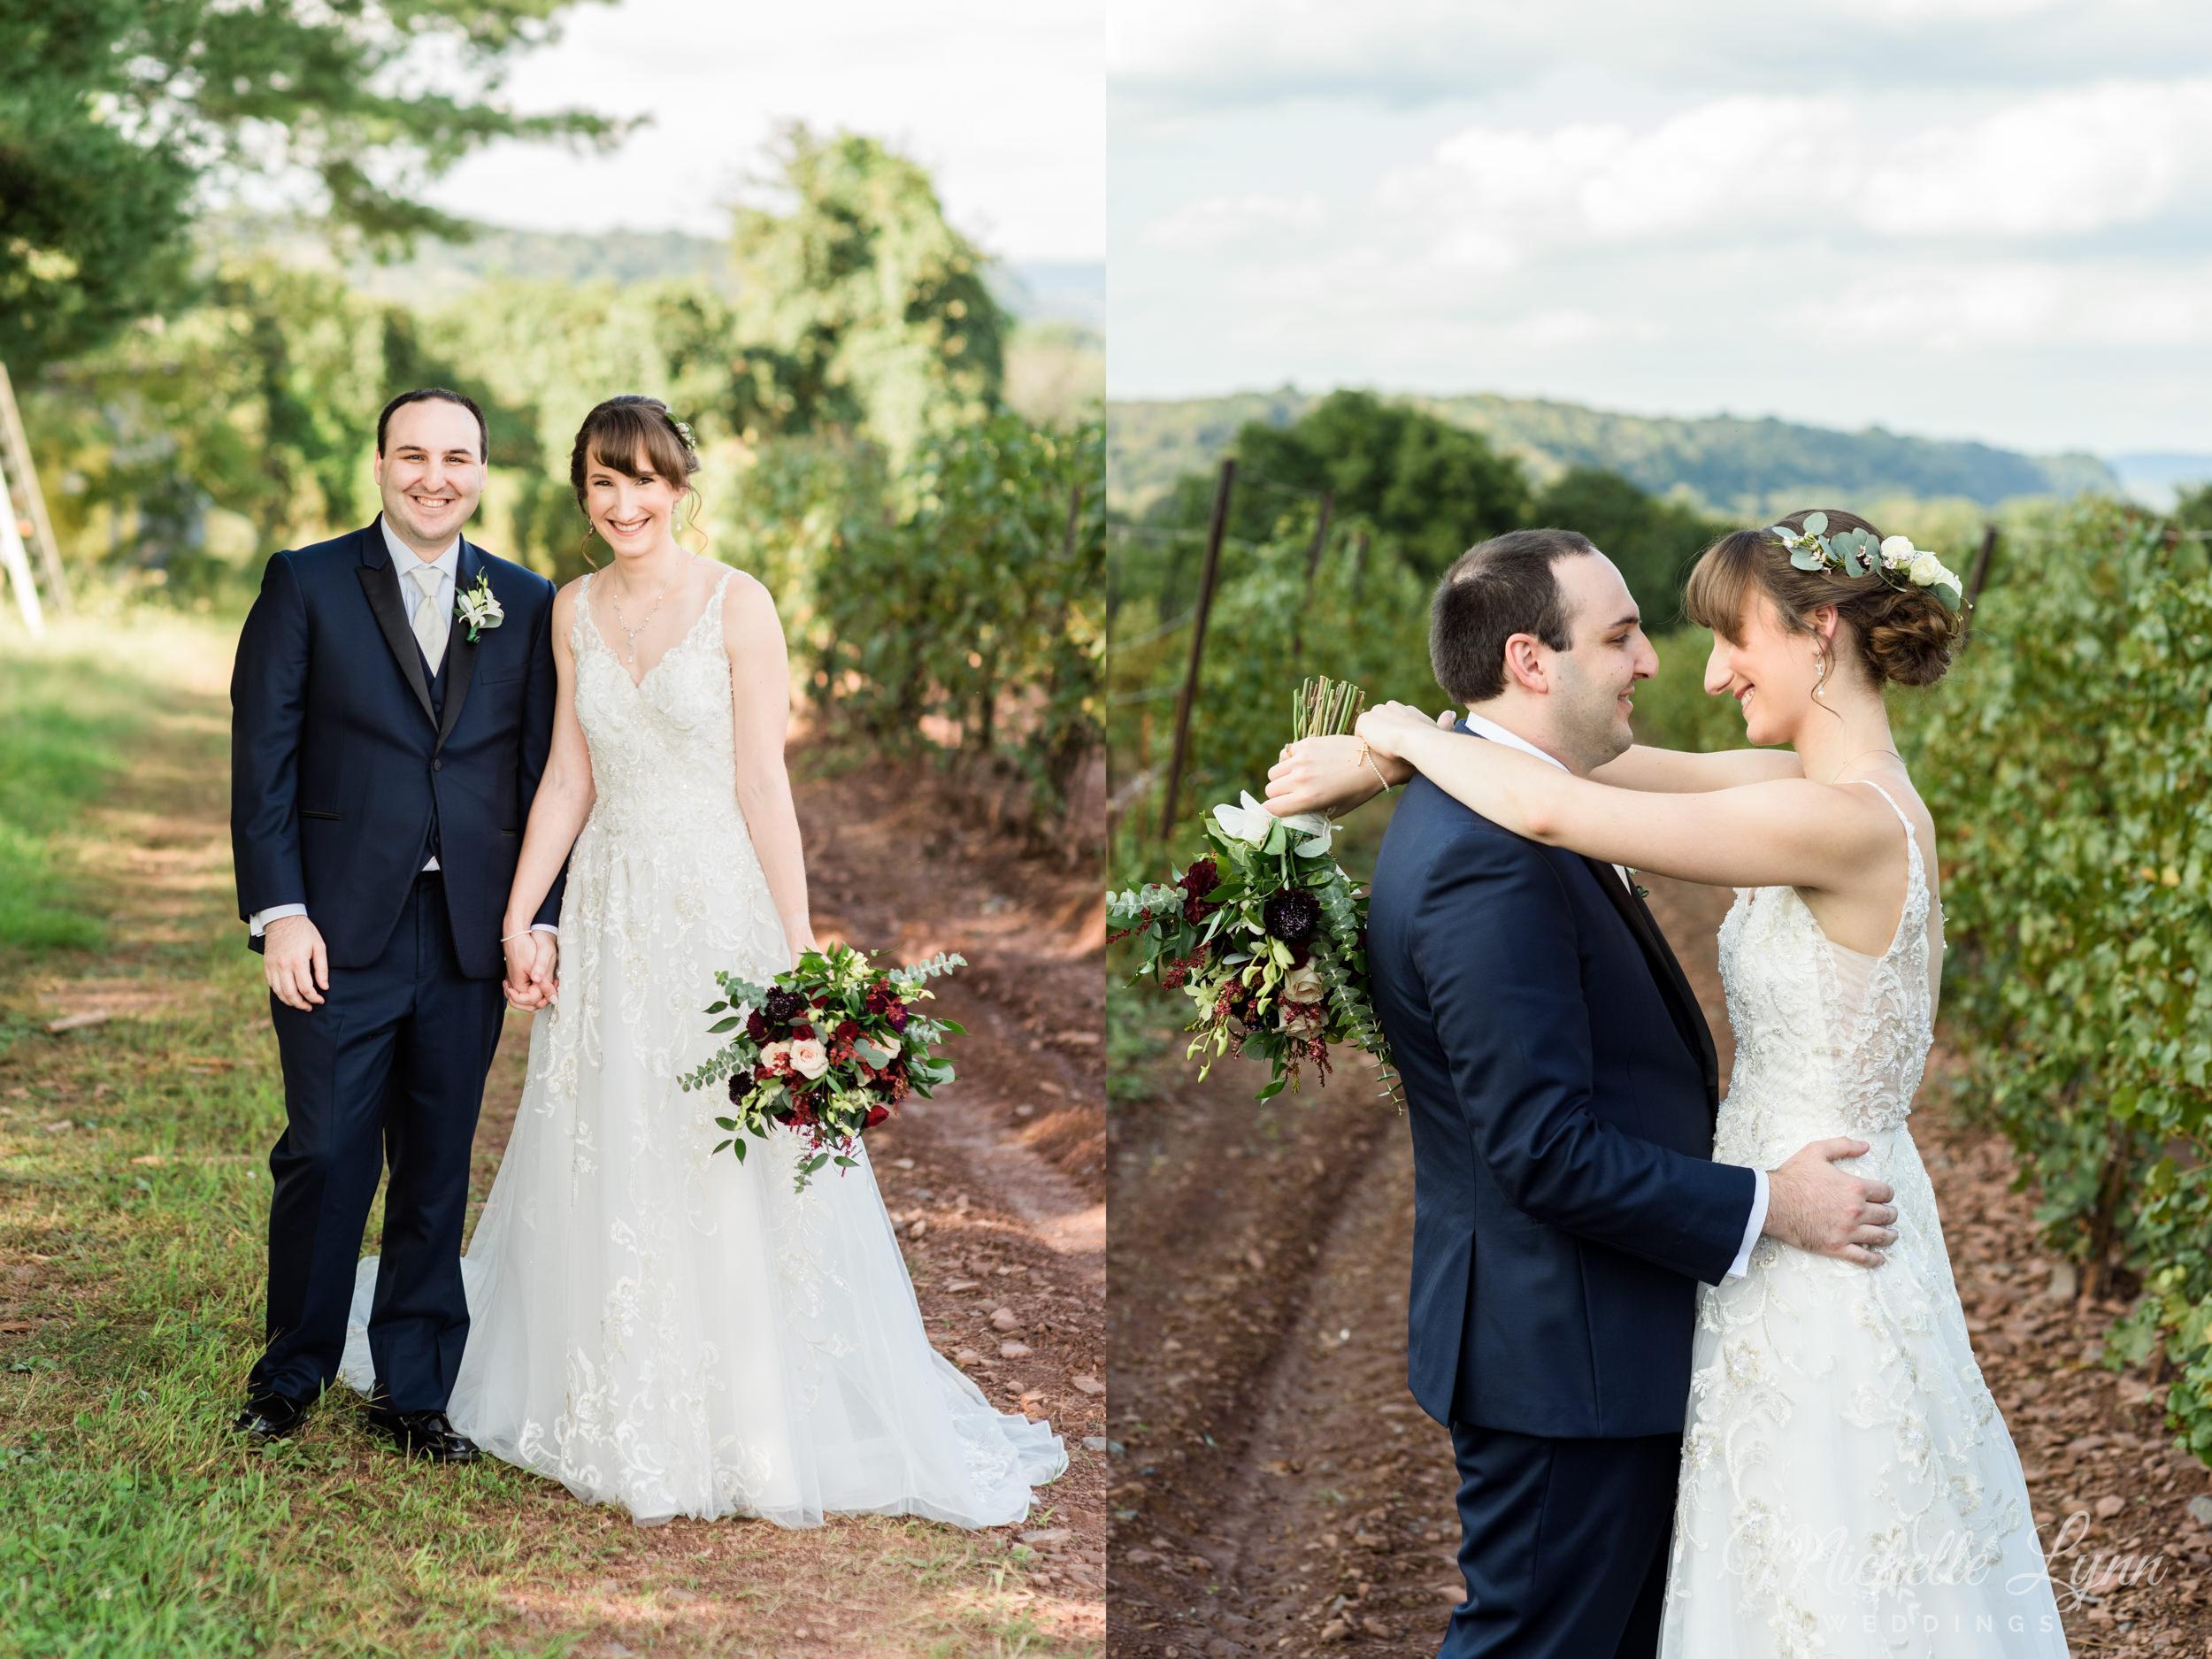 sand-castle-winery-pennsylvania-wedding-photography-43.jpg